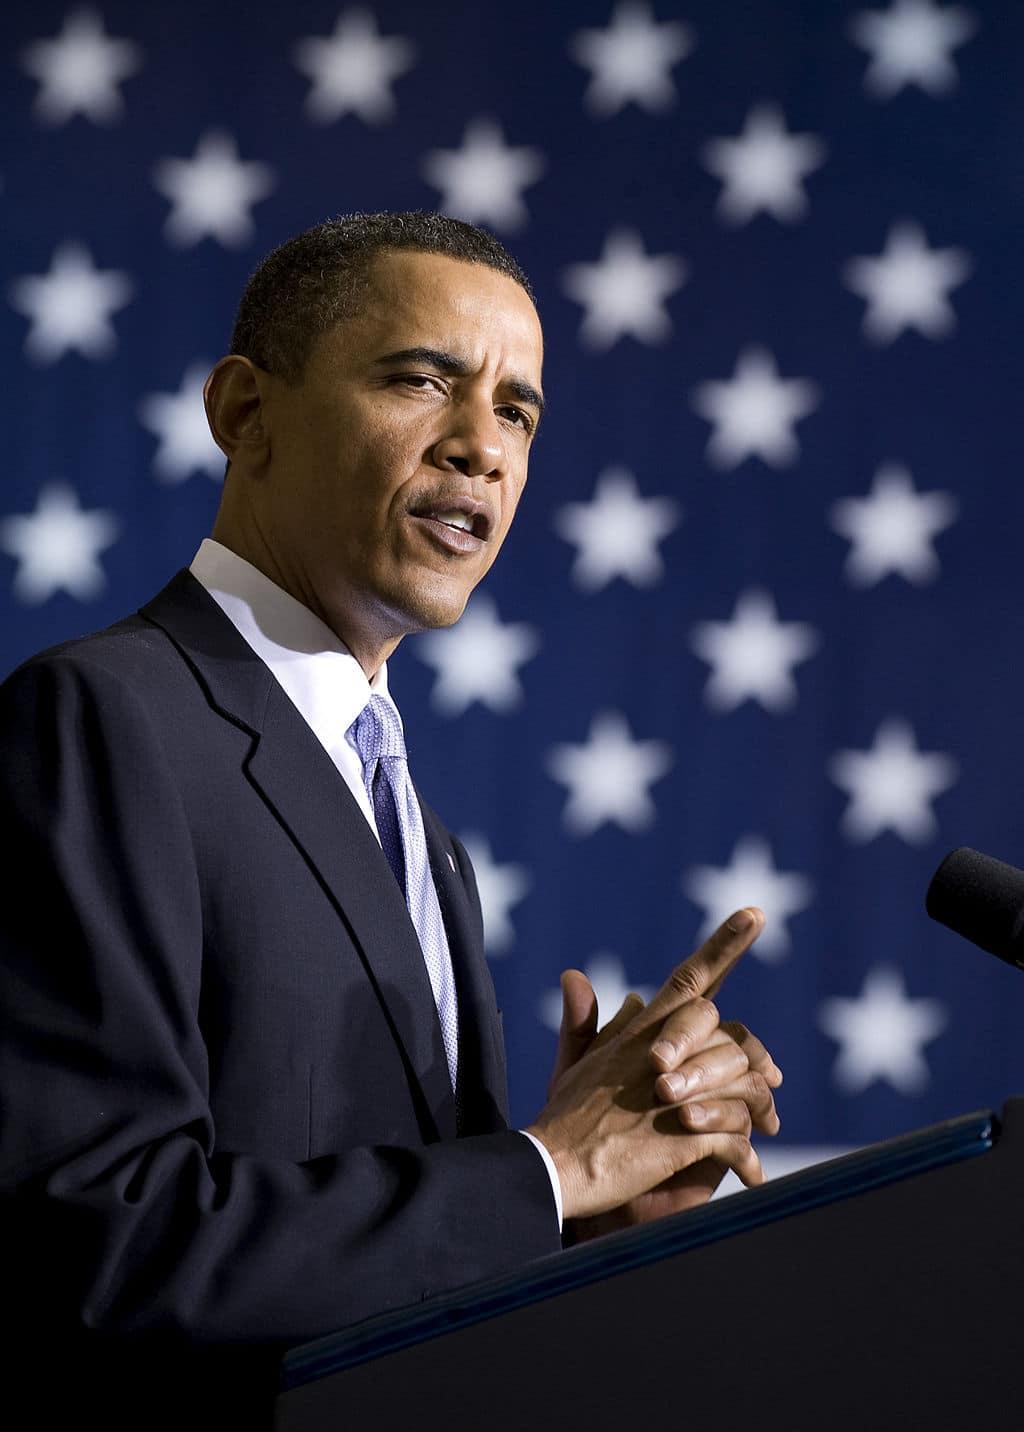 United States President Barack Obama speaks